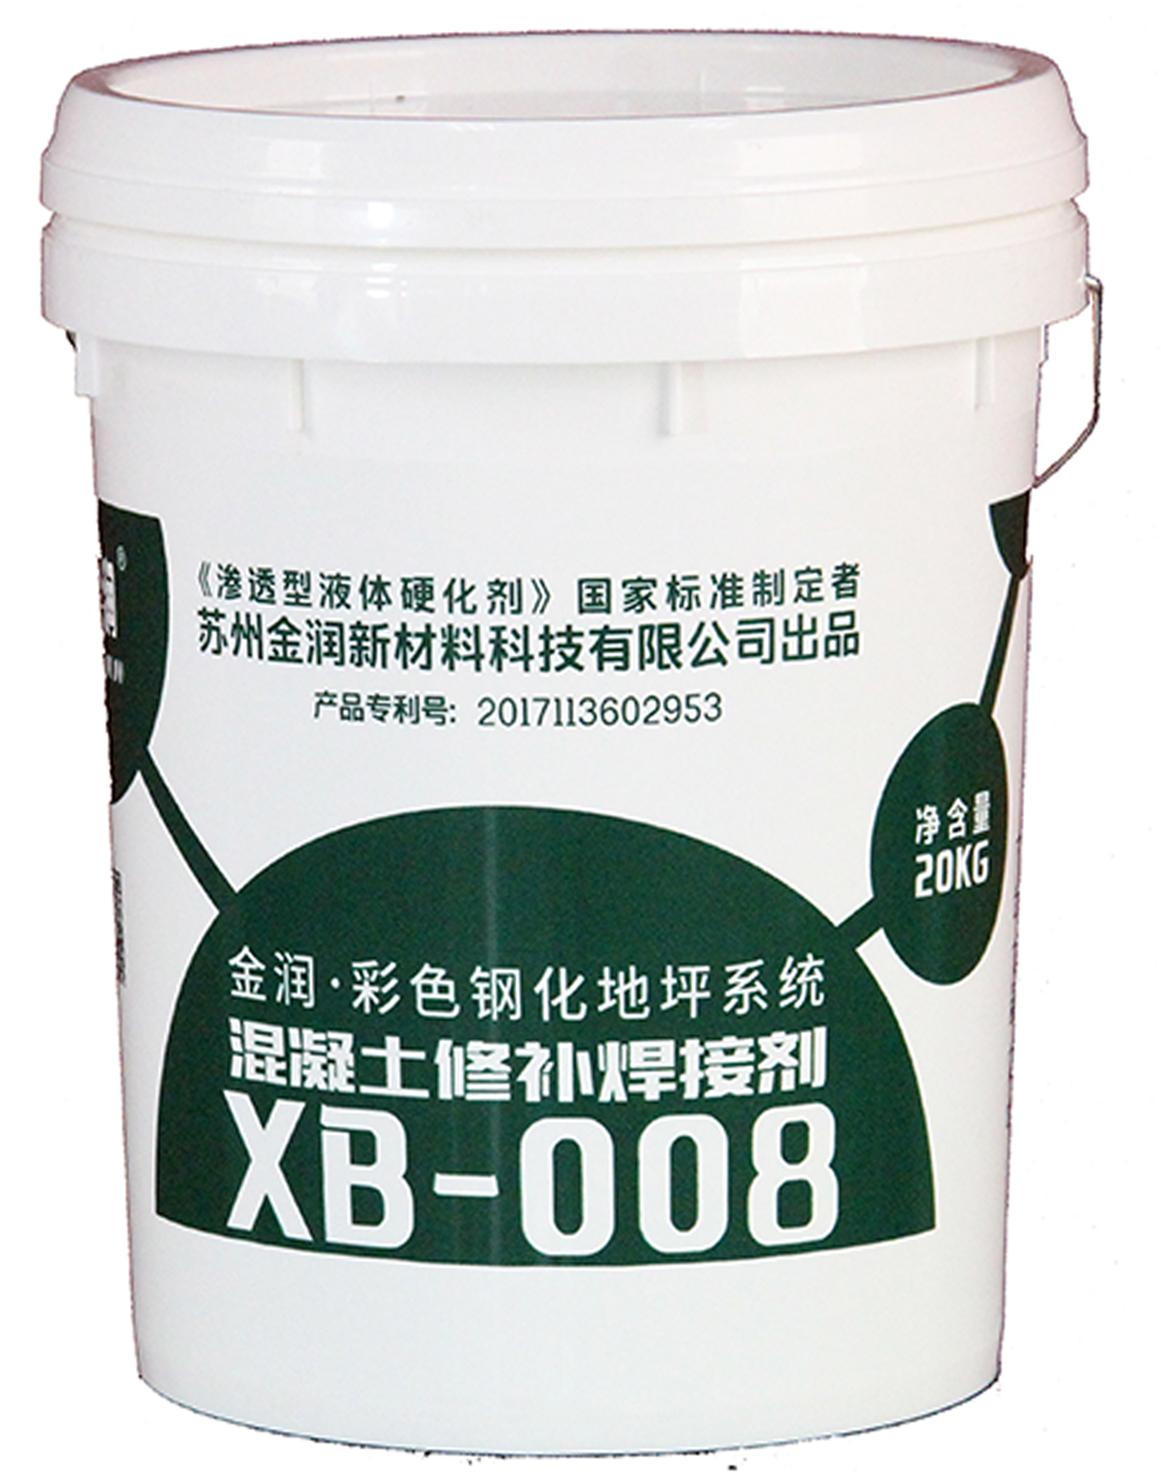 XB-008-金润混凝土修补剂